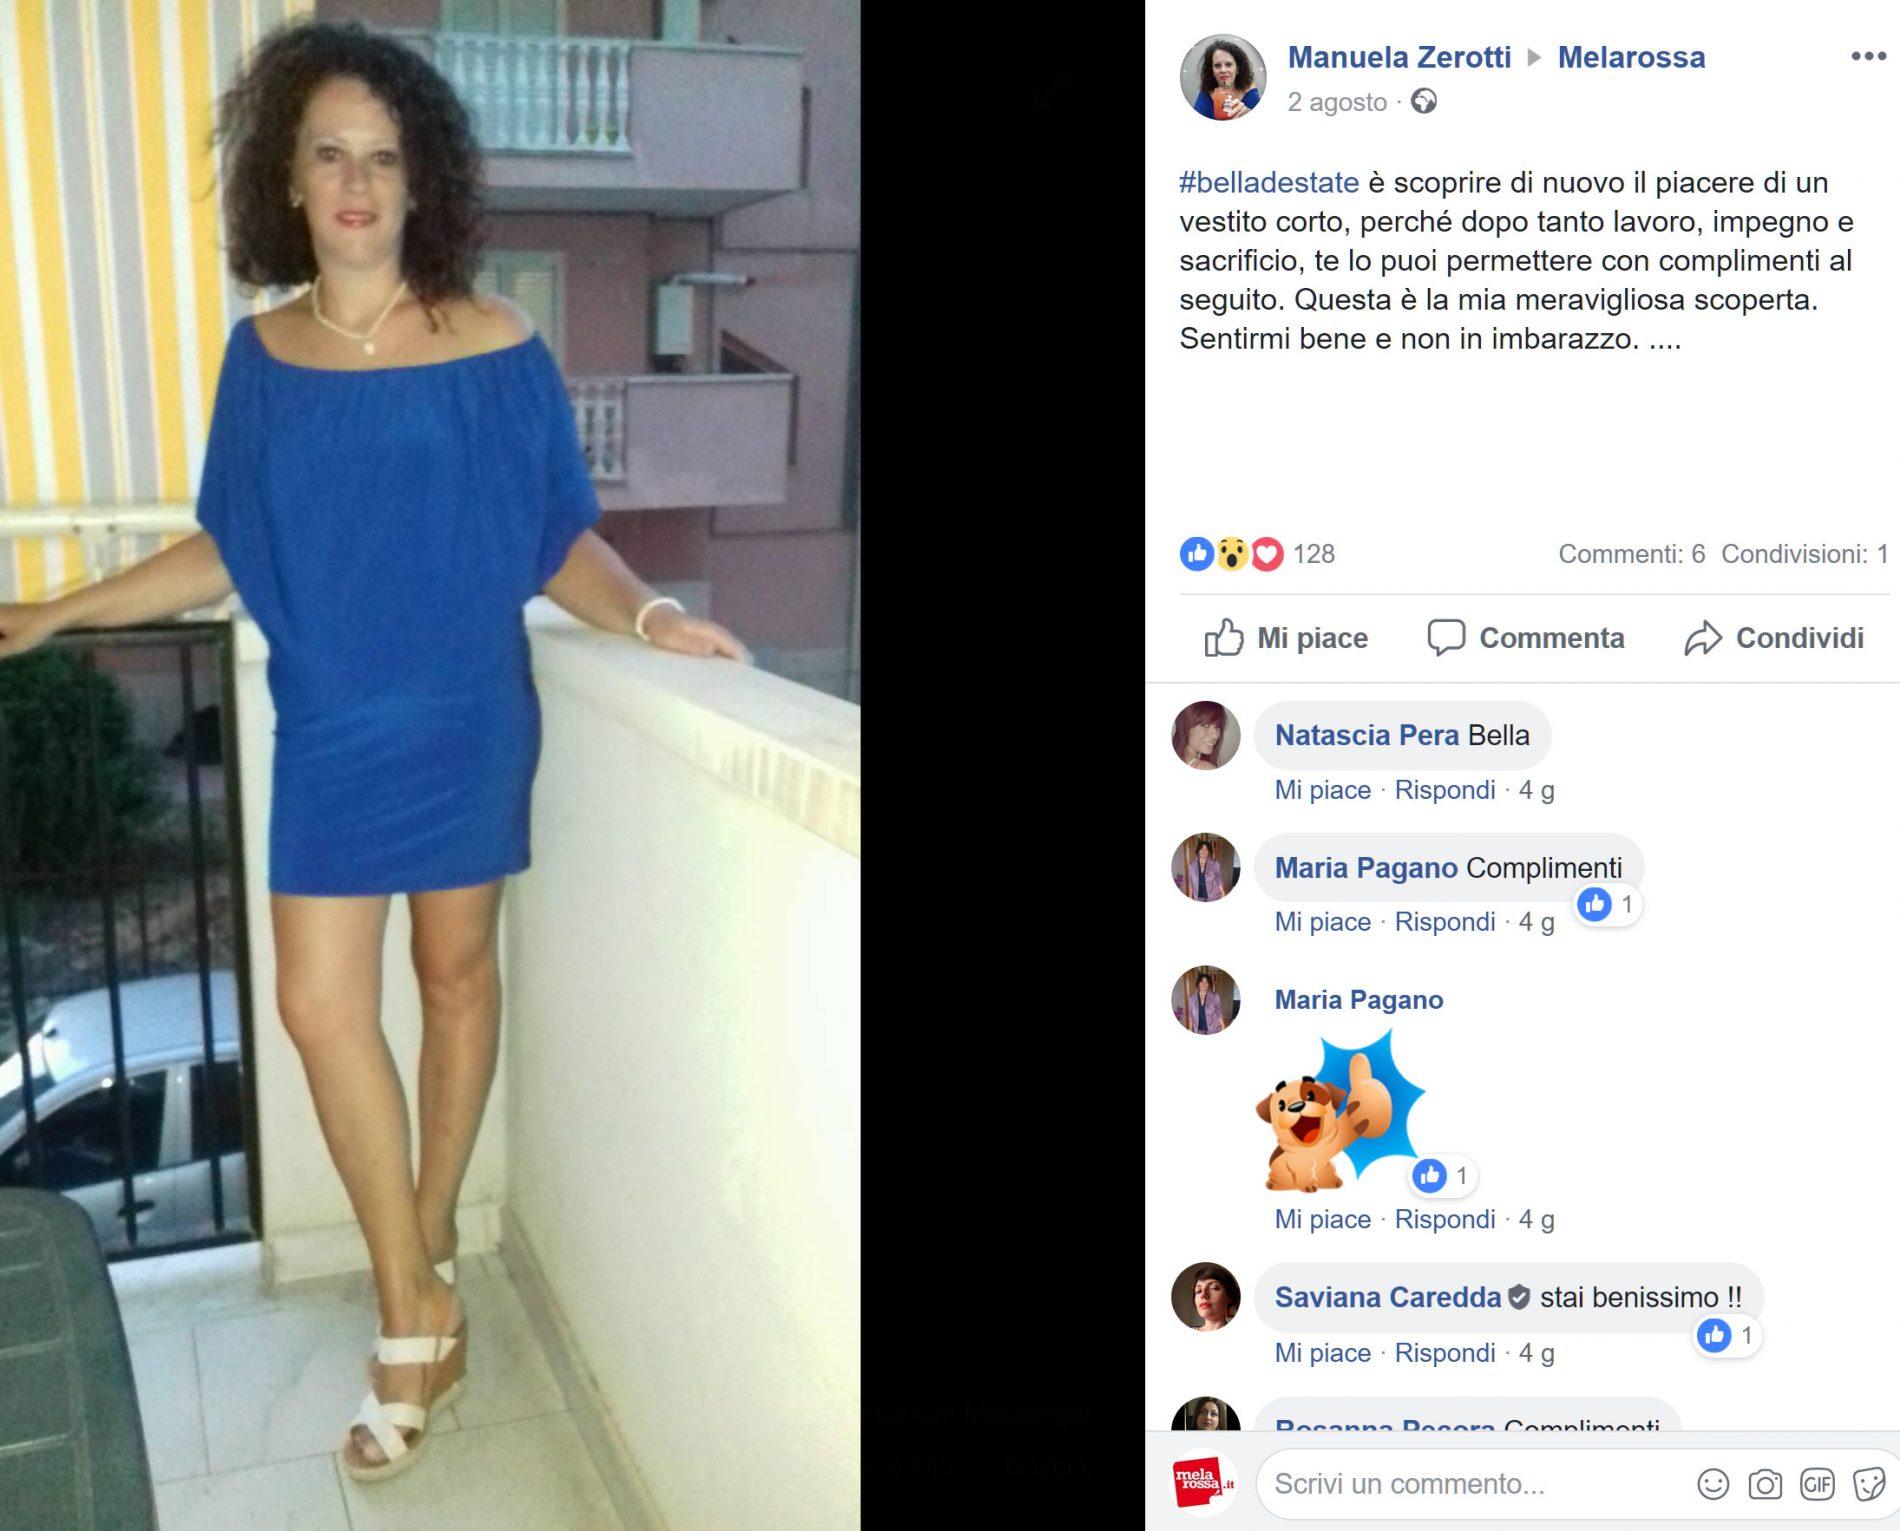 Manuela Zerotti #belladestate